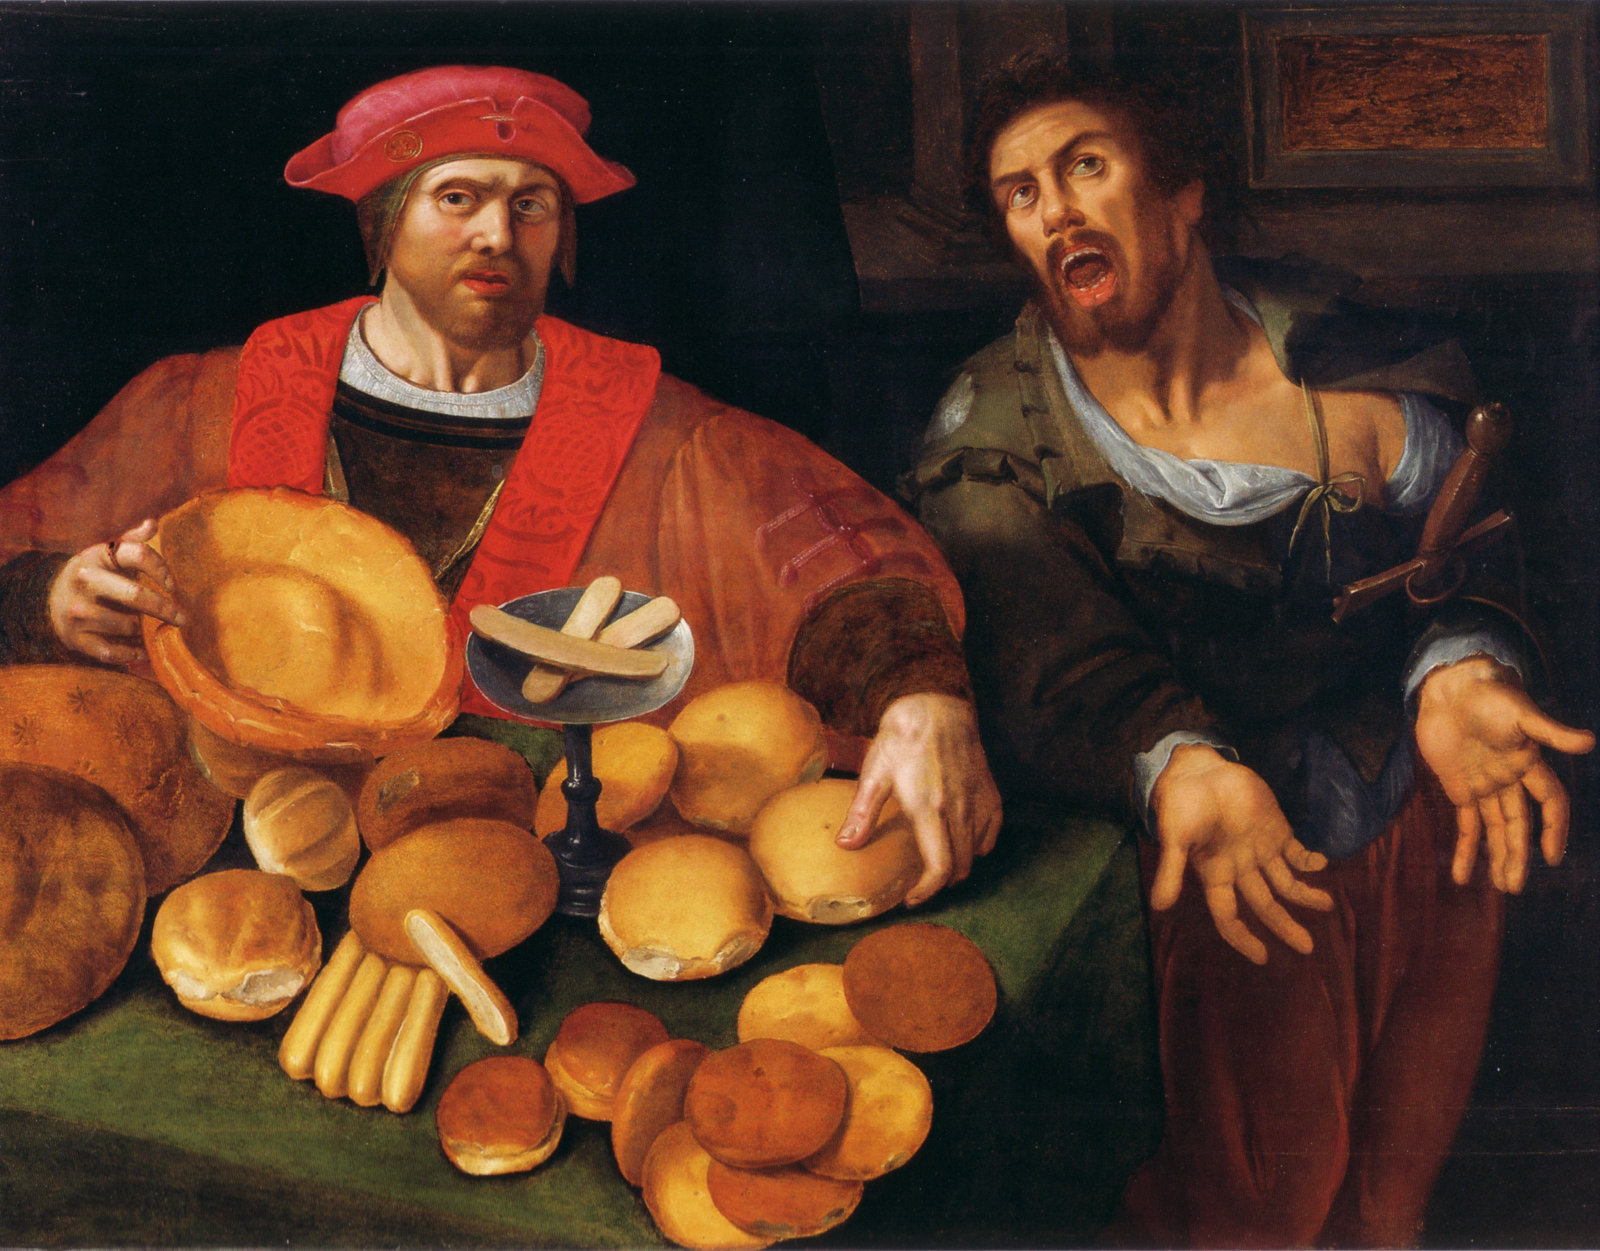 Голландский натюрморт 17 века